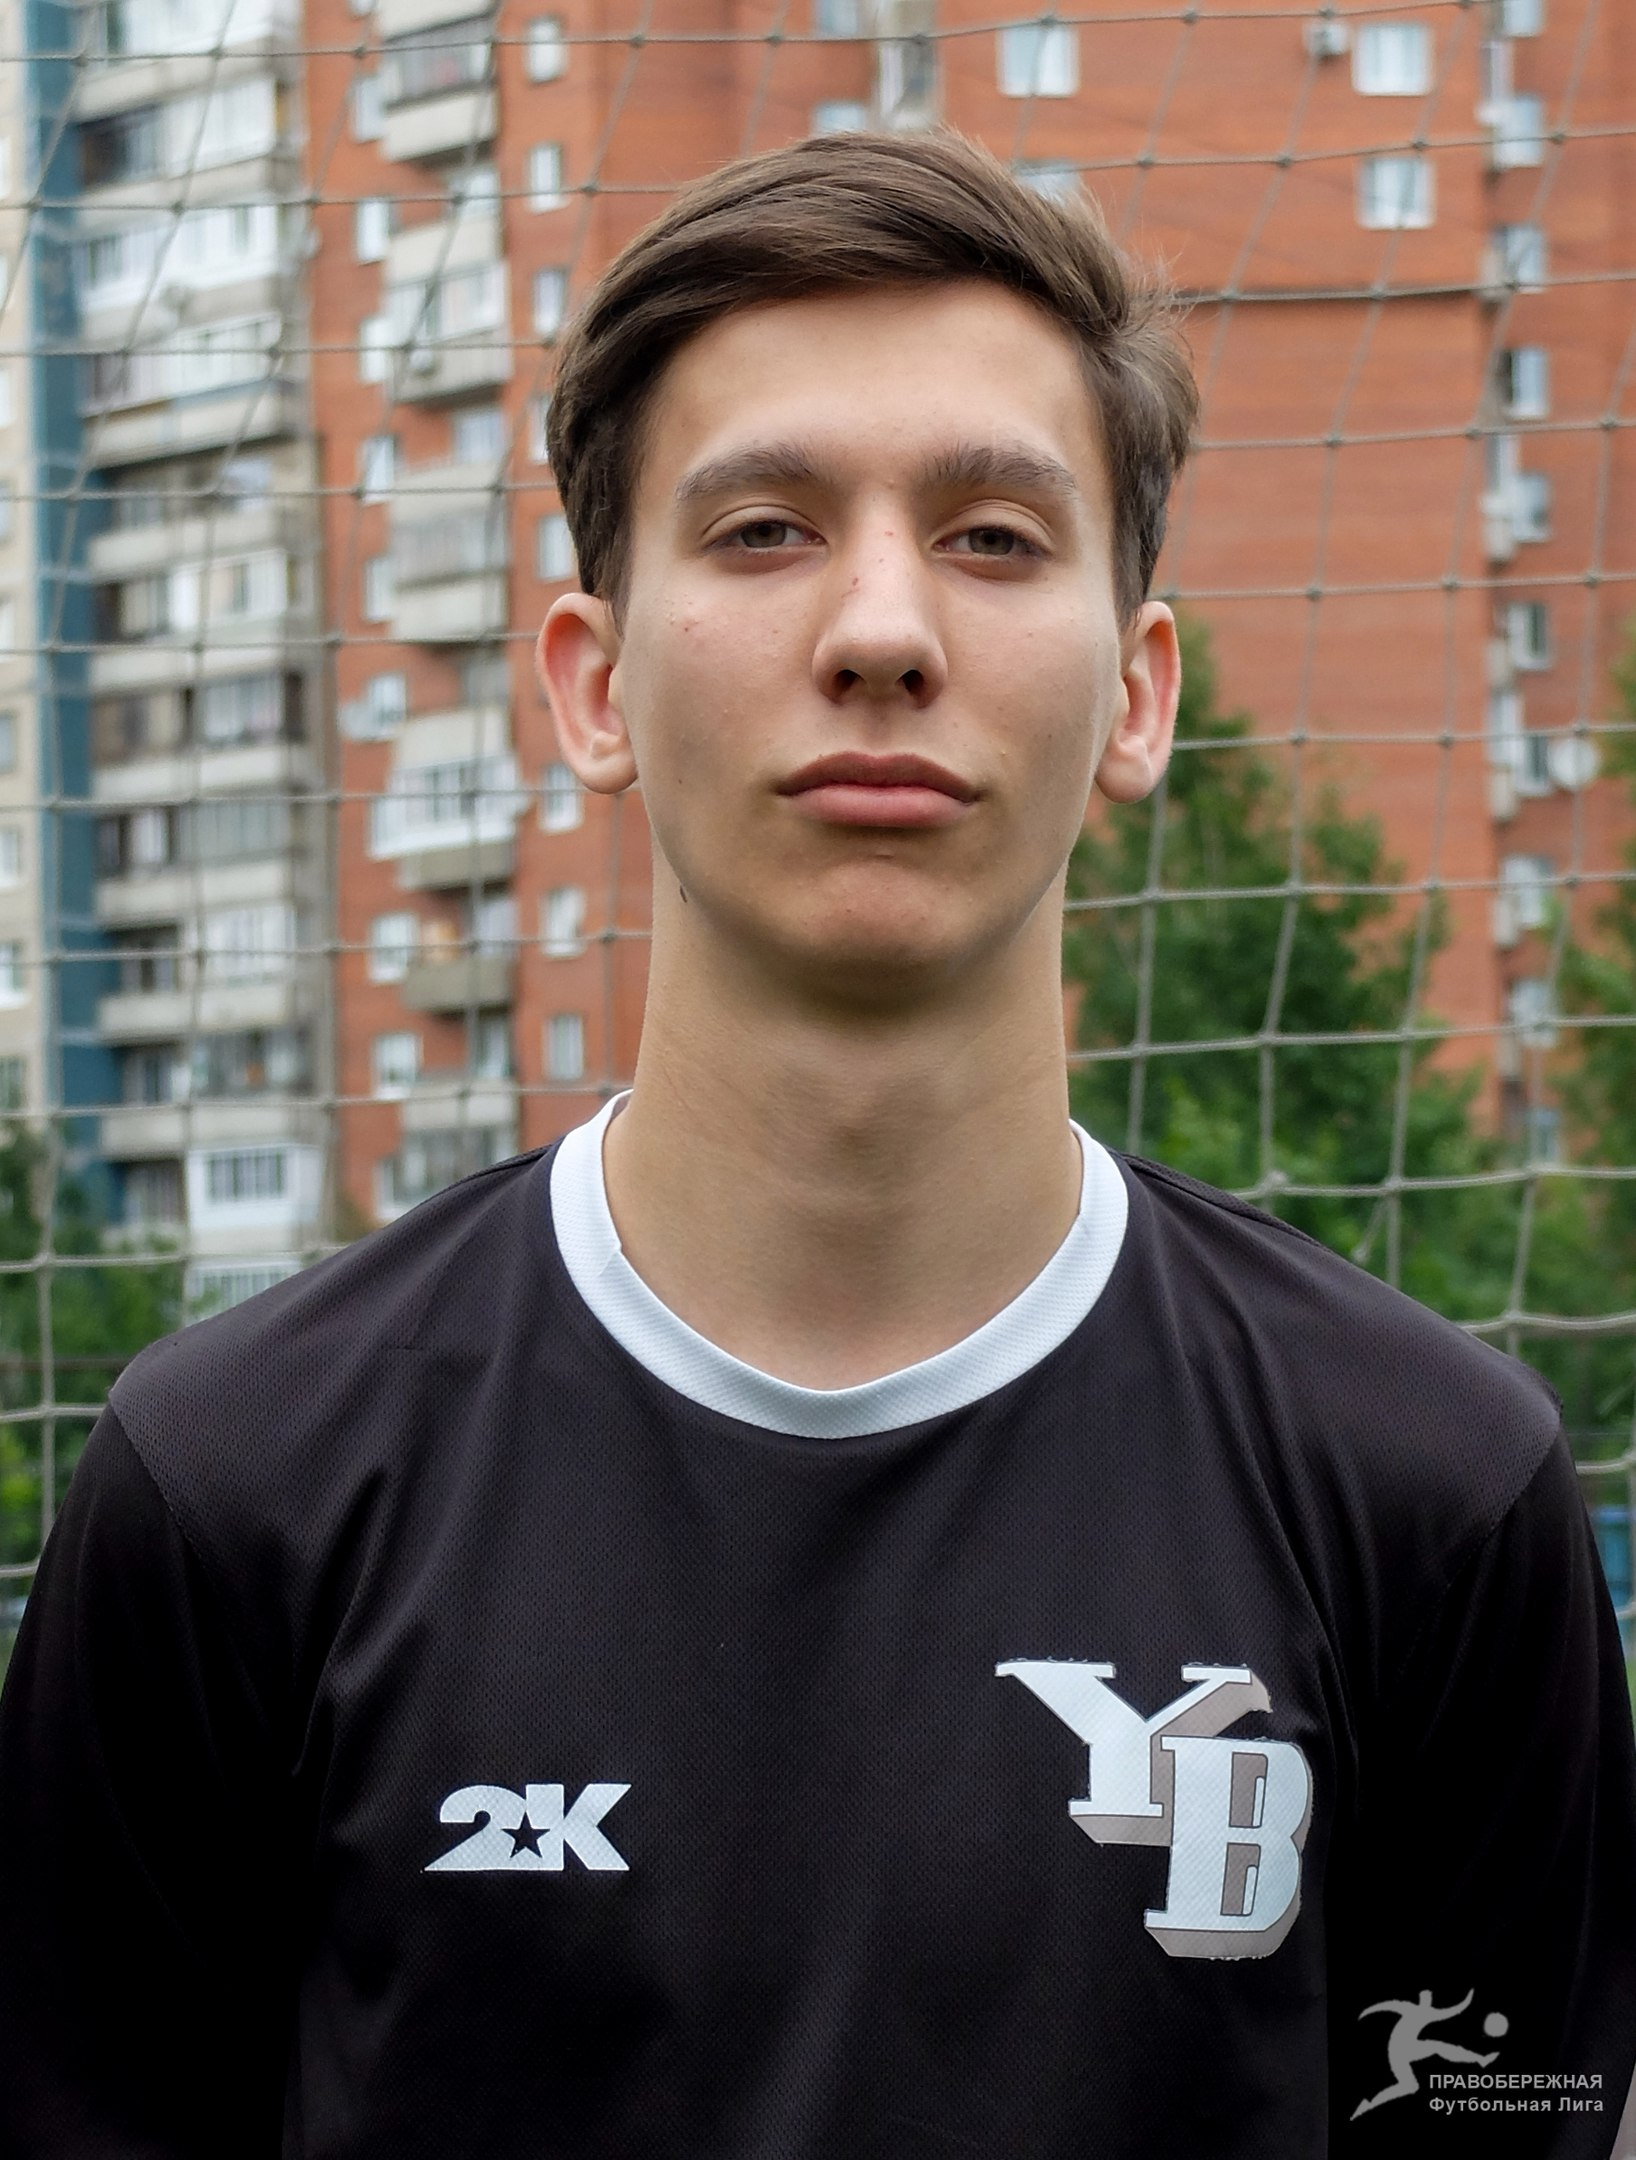 Денисюк Станислав